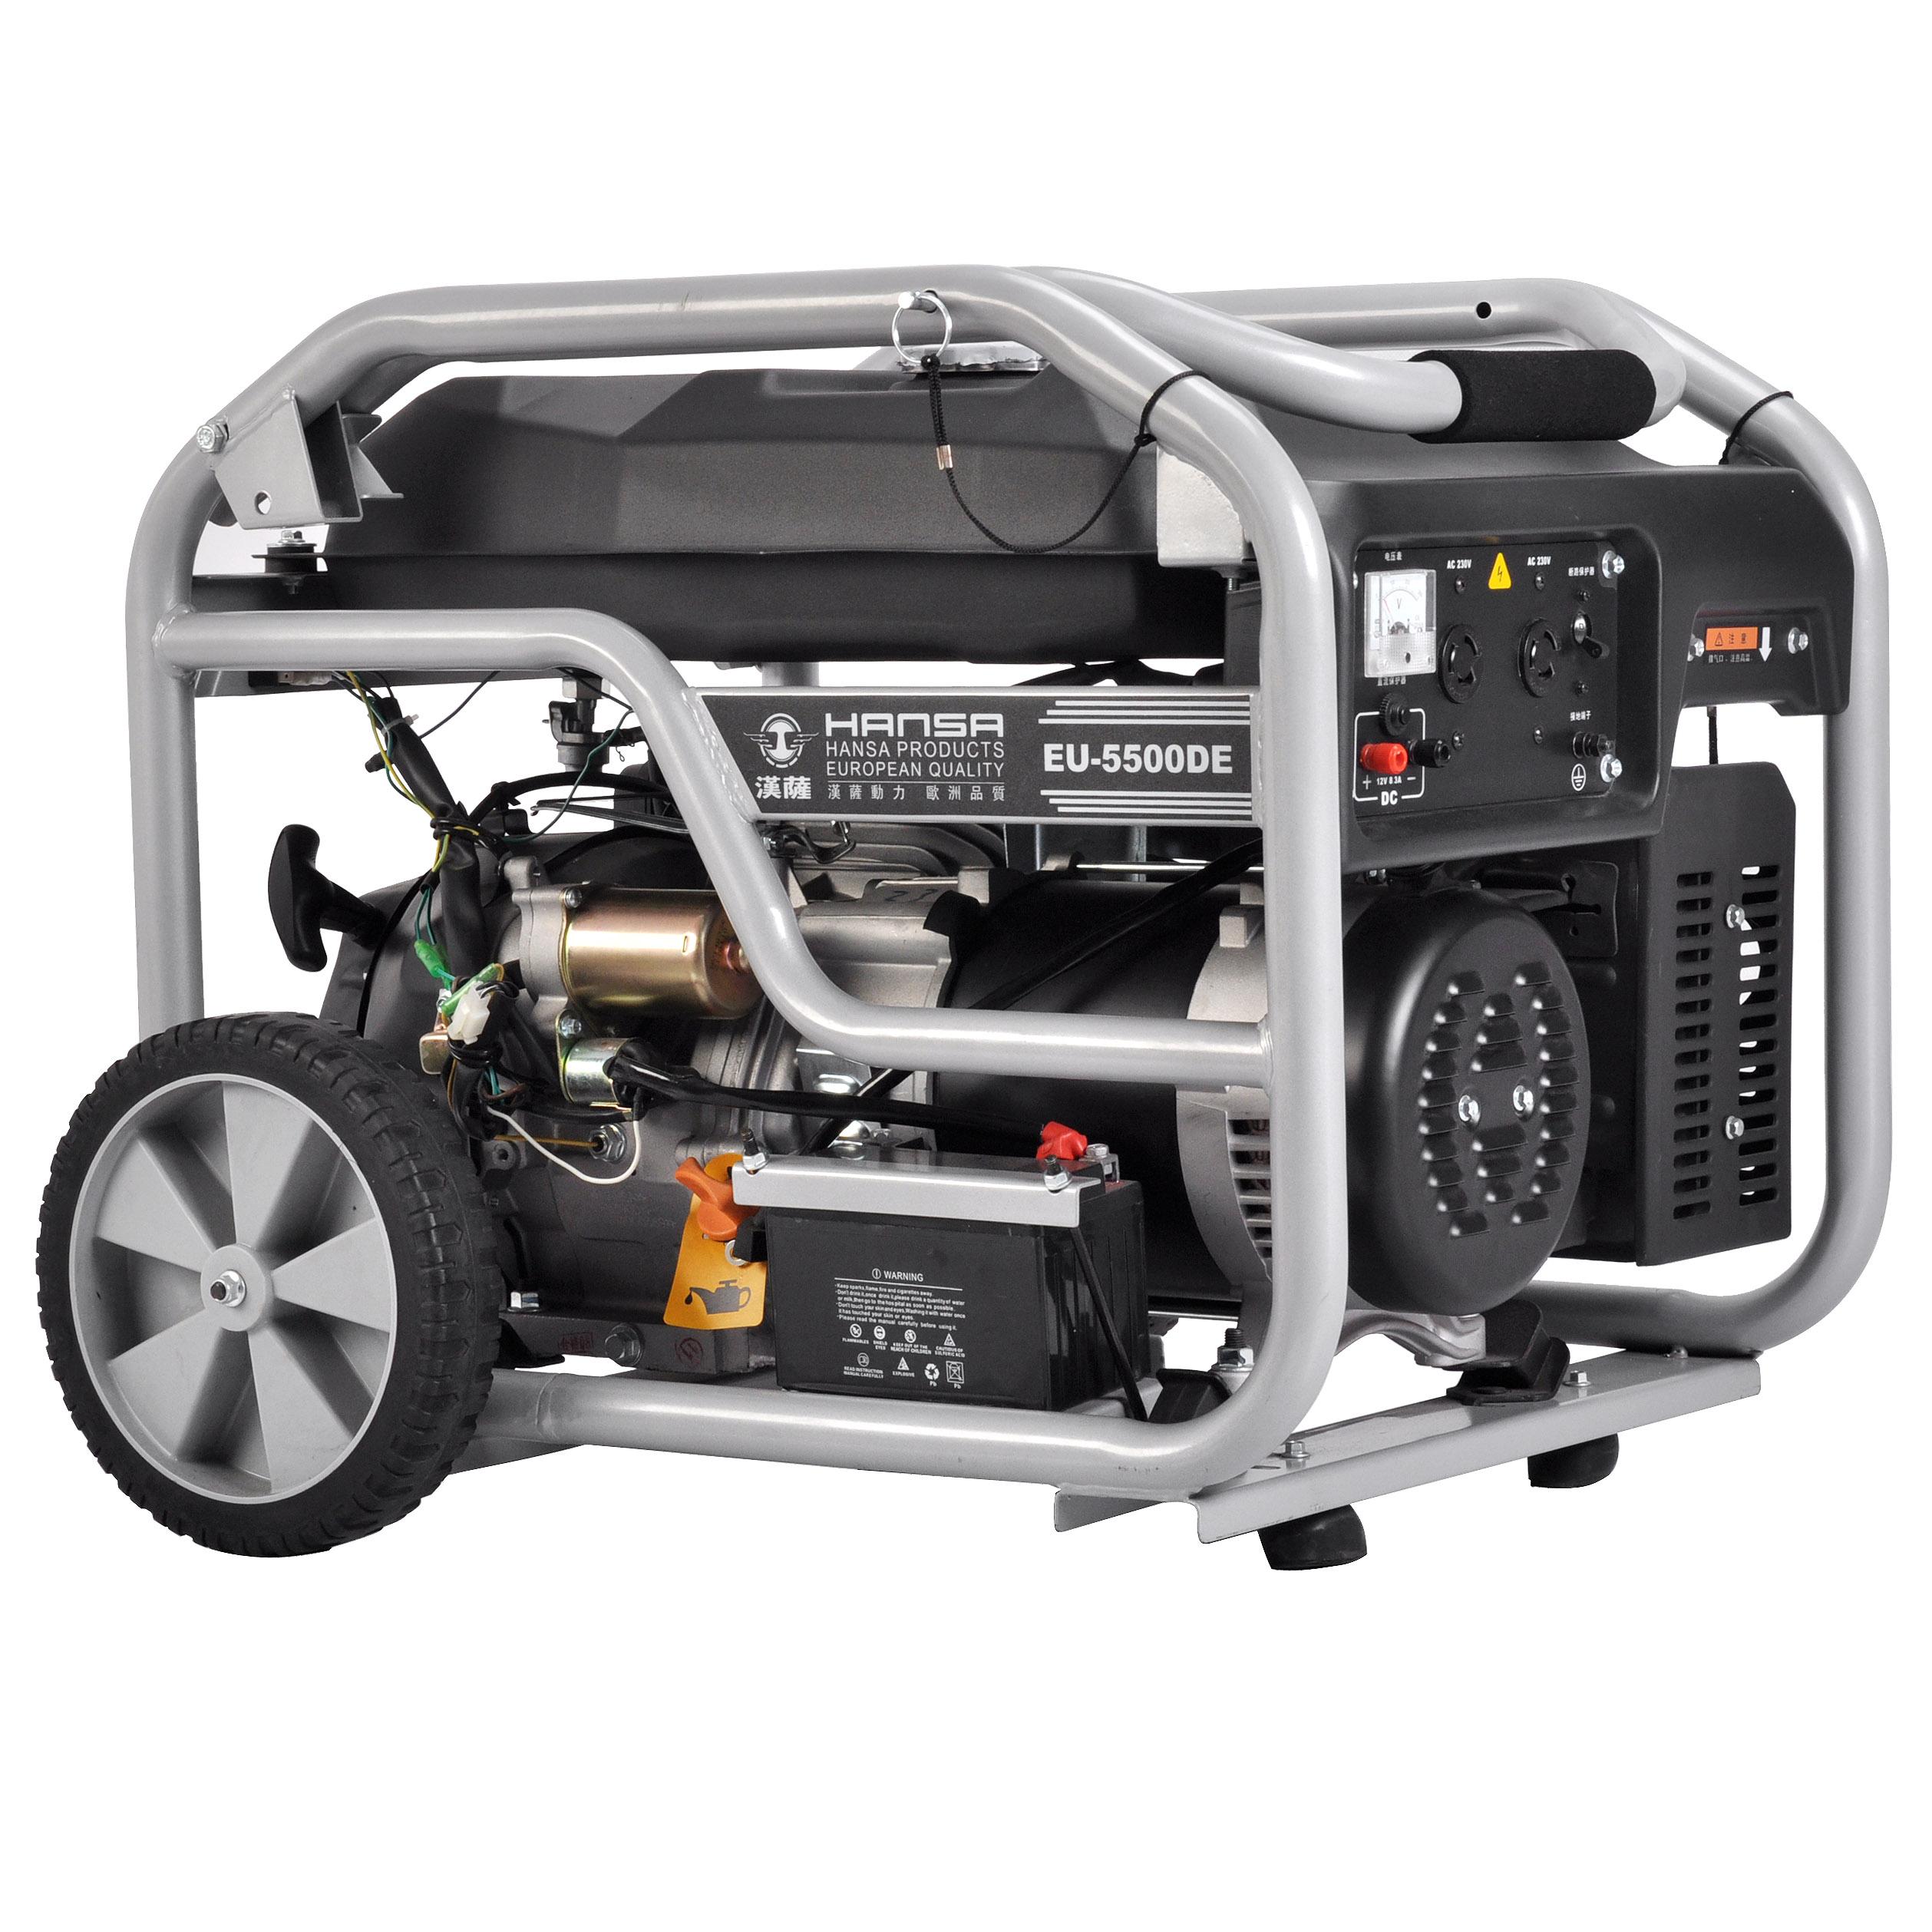 5KW单相汽油发电机——EU-5500DE